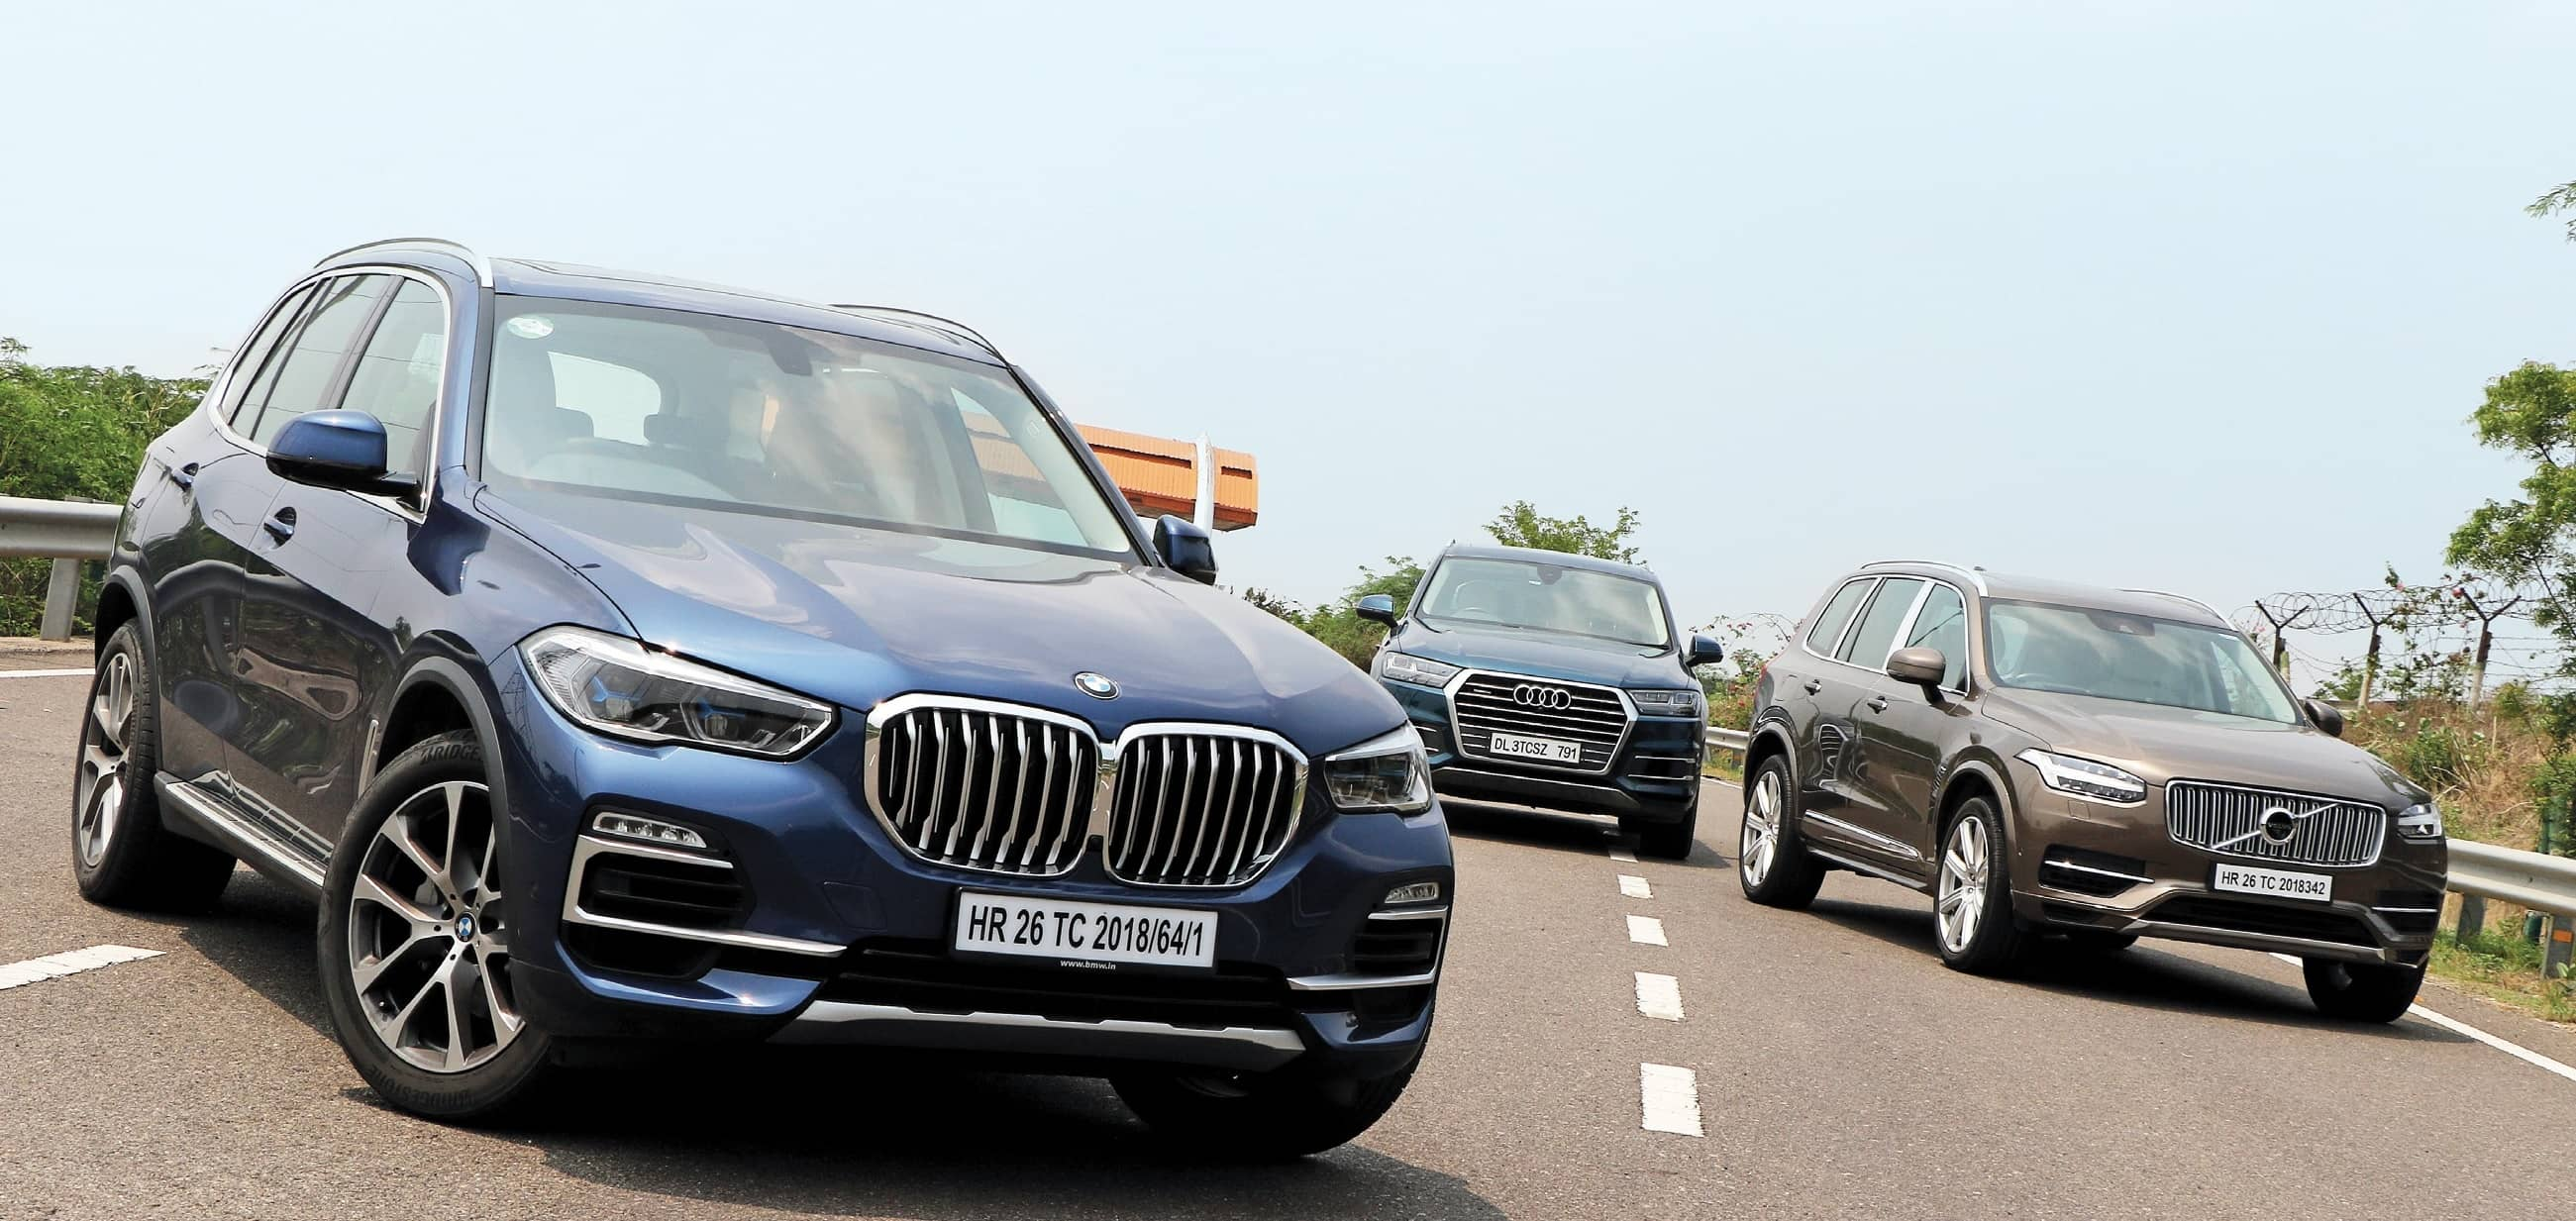 BMW X5 Vs Volvo XC90 Vs Audi Q7